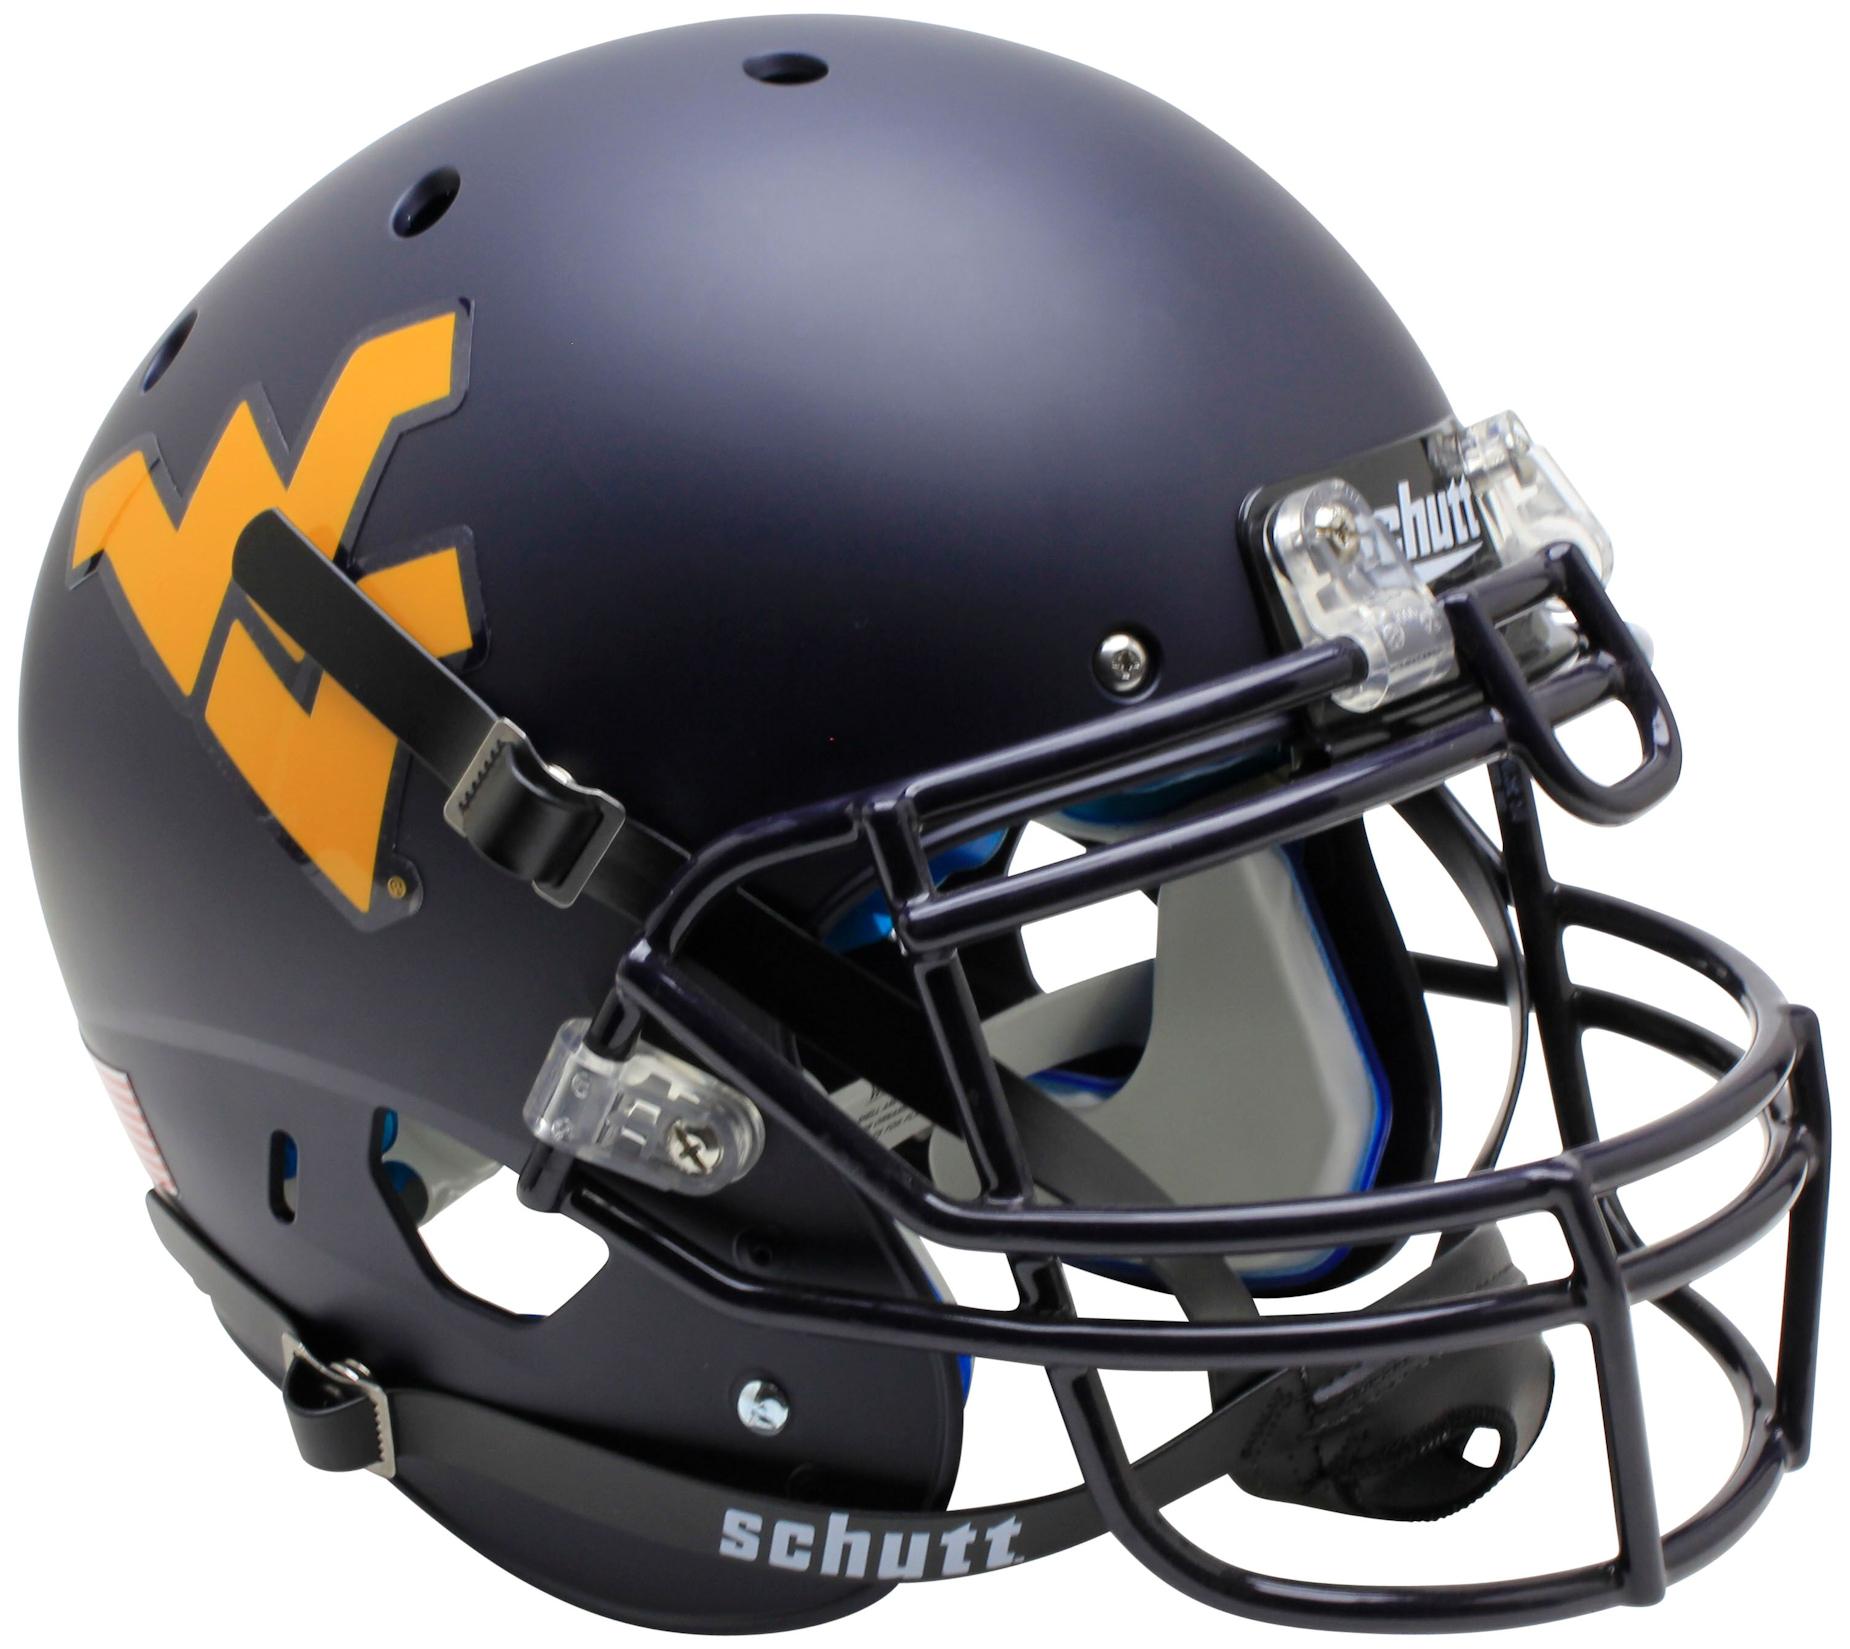 West Virginia Mountaineers Authentic College XP Football Helmet Schutt <B>Country Roads Bumper</B>